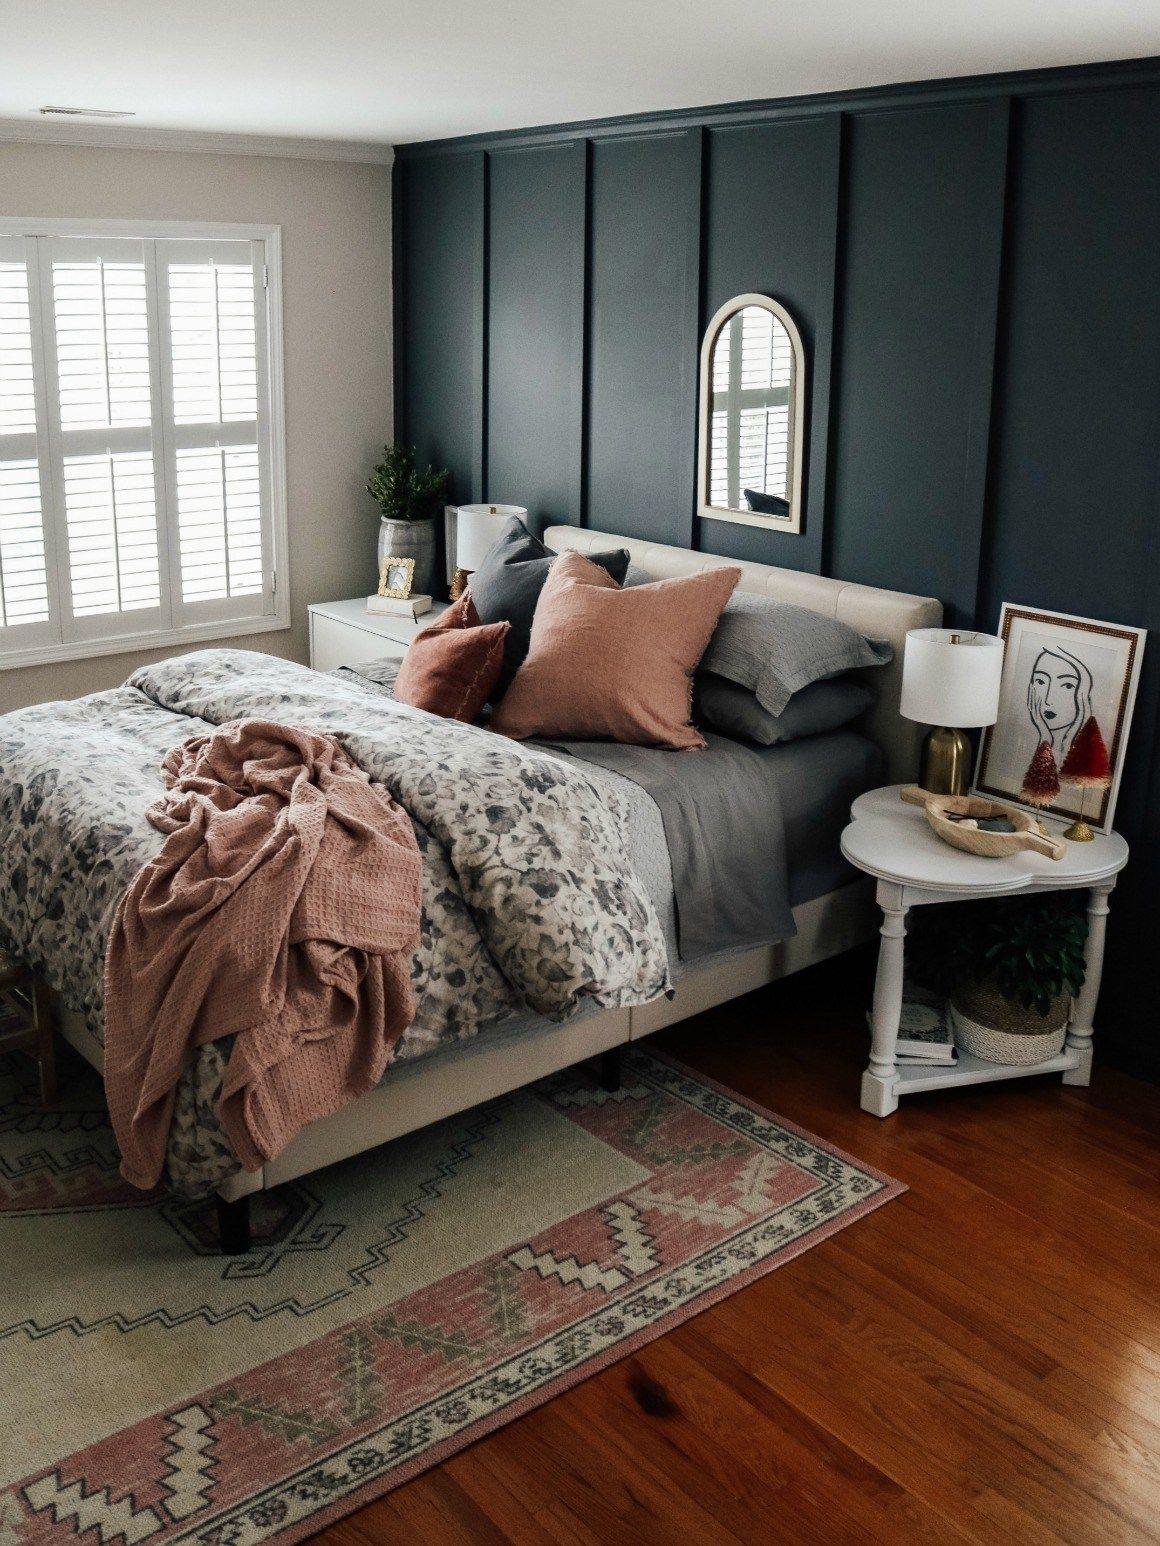 Bedroom Makeover For A Deserving Single Mom Nesting With Grace Apartment Bedroom Design Bedroom Design Trends Master Bedroom Inspiration